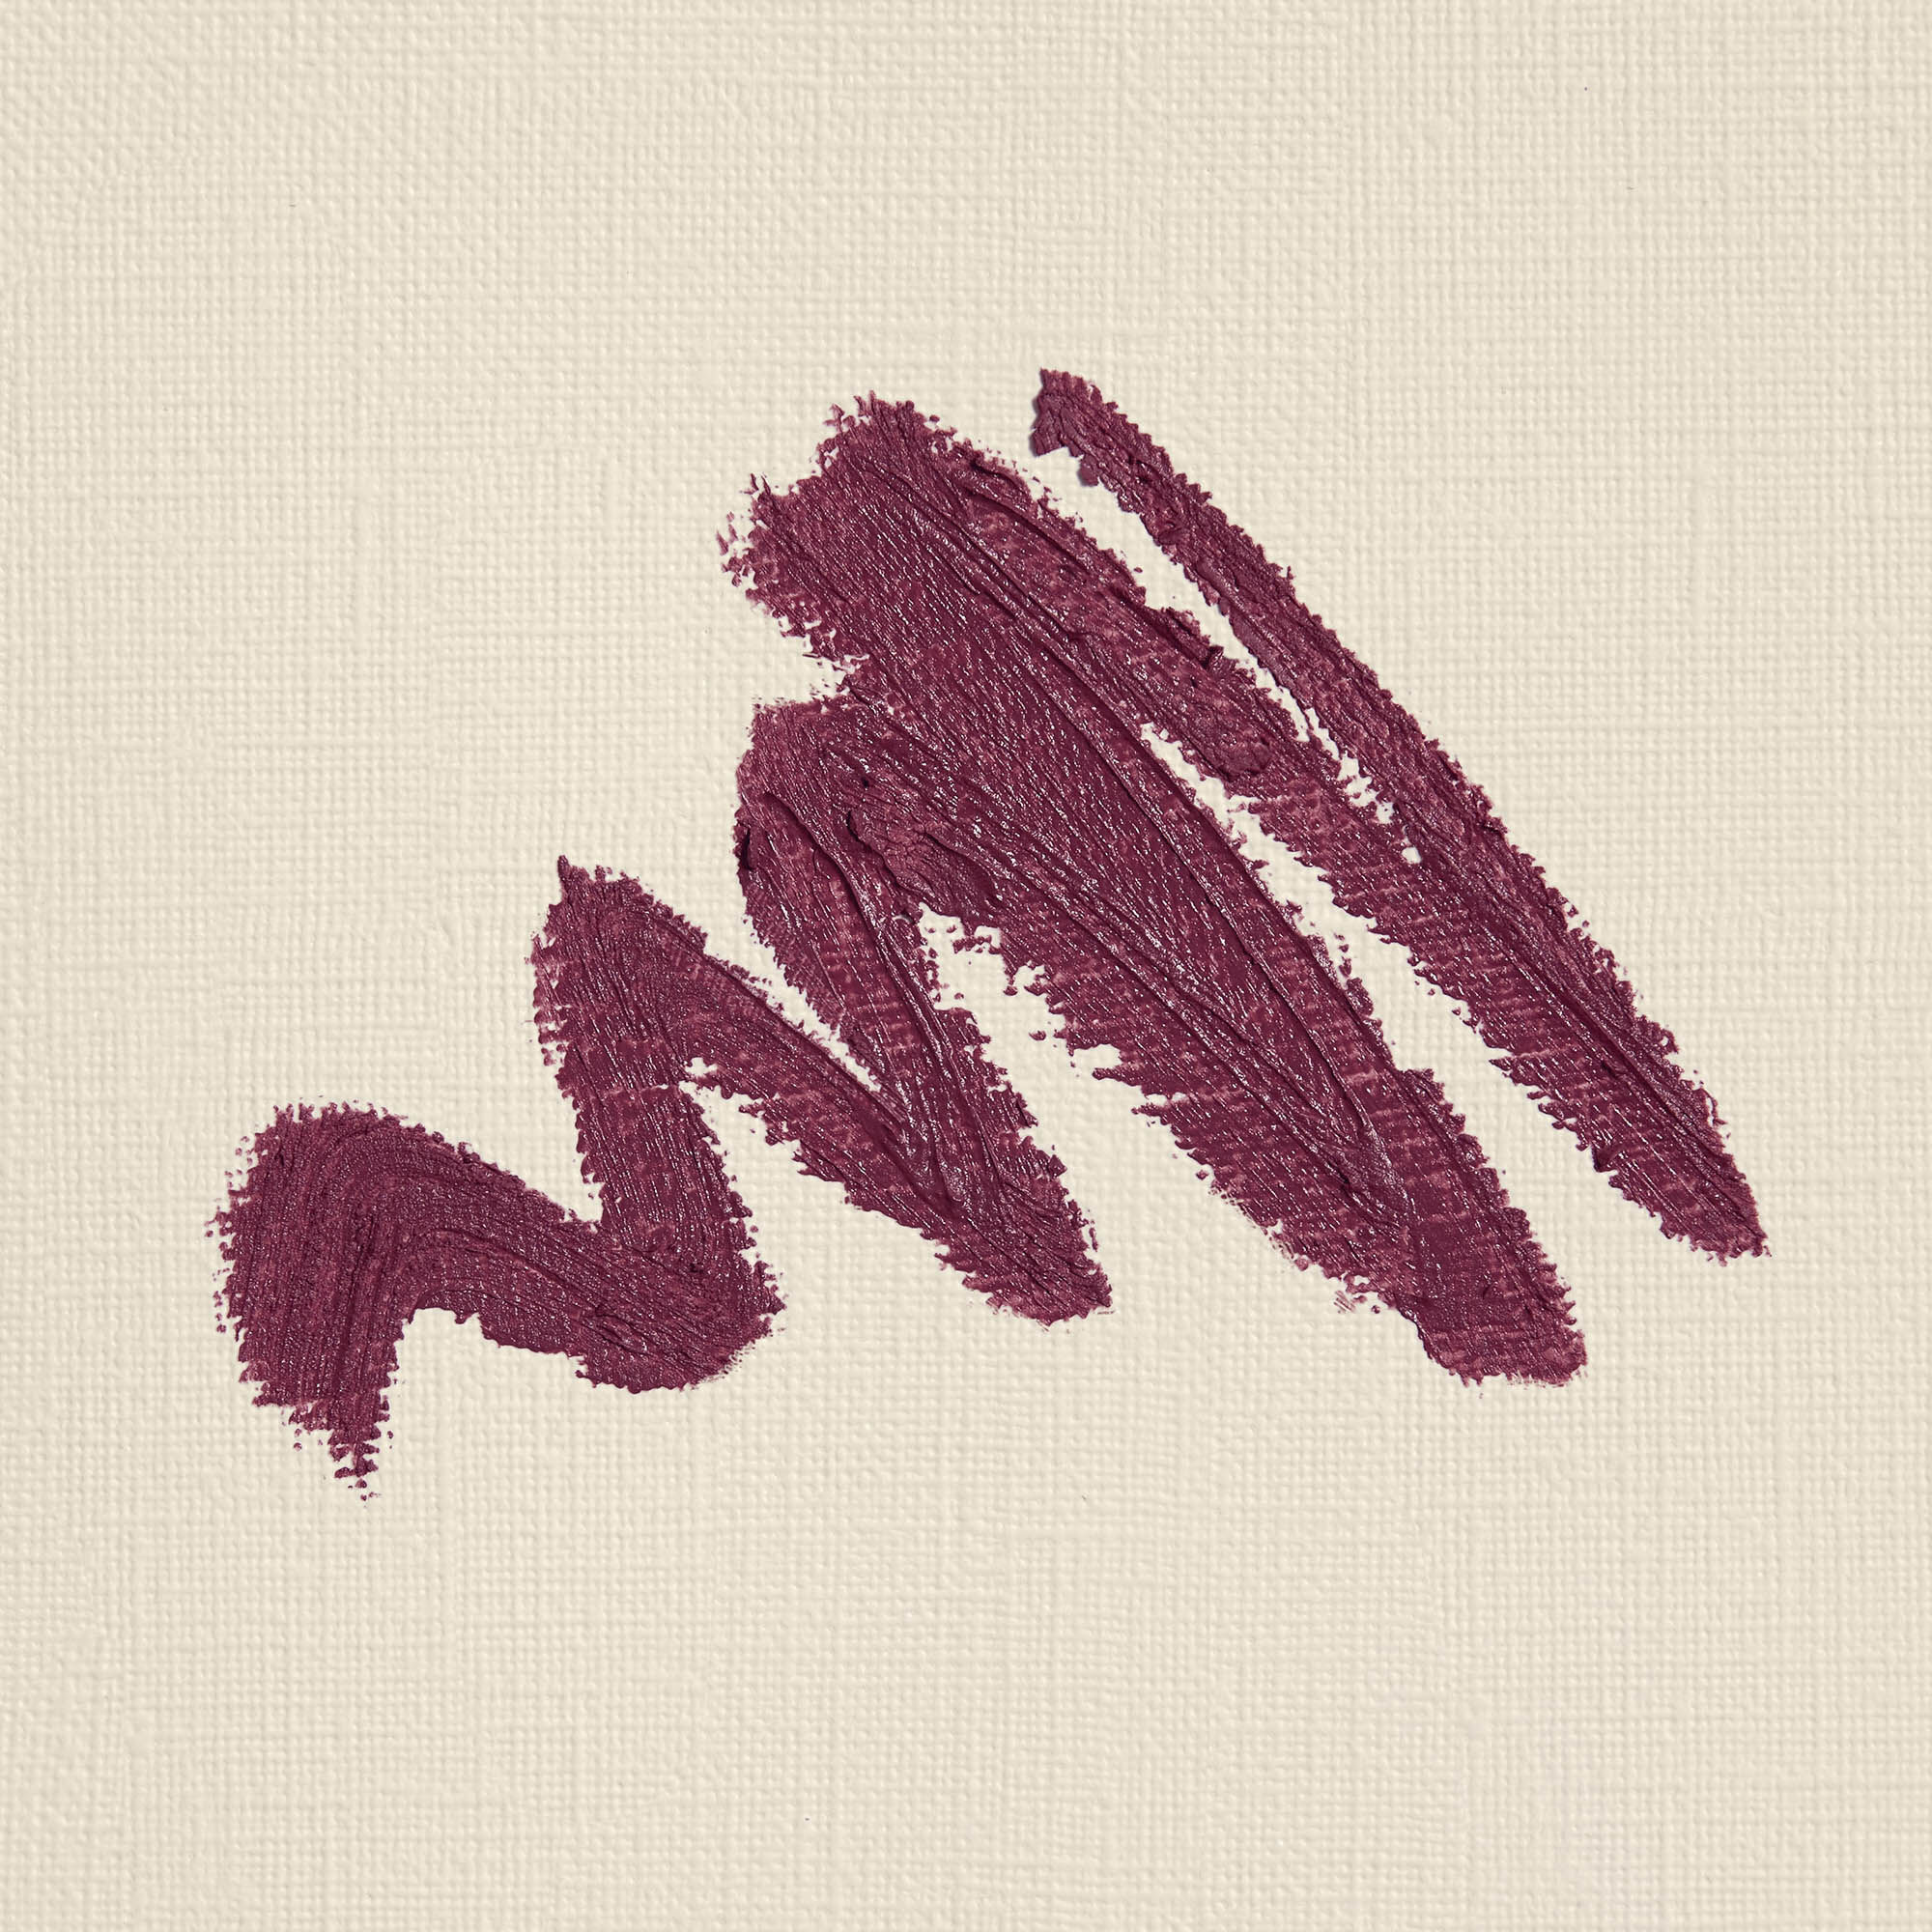 Lip Crayon, Demi Matte, Mulberry